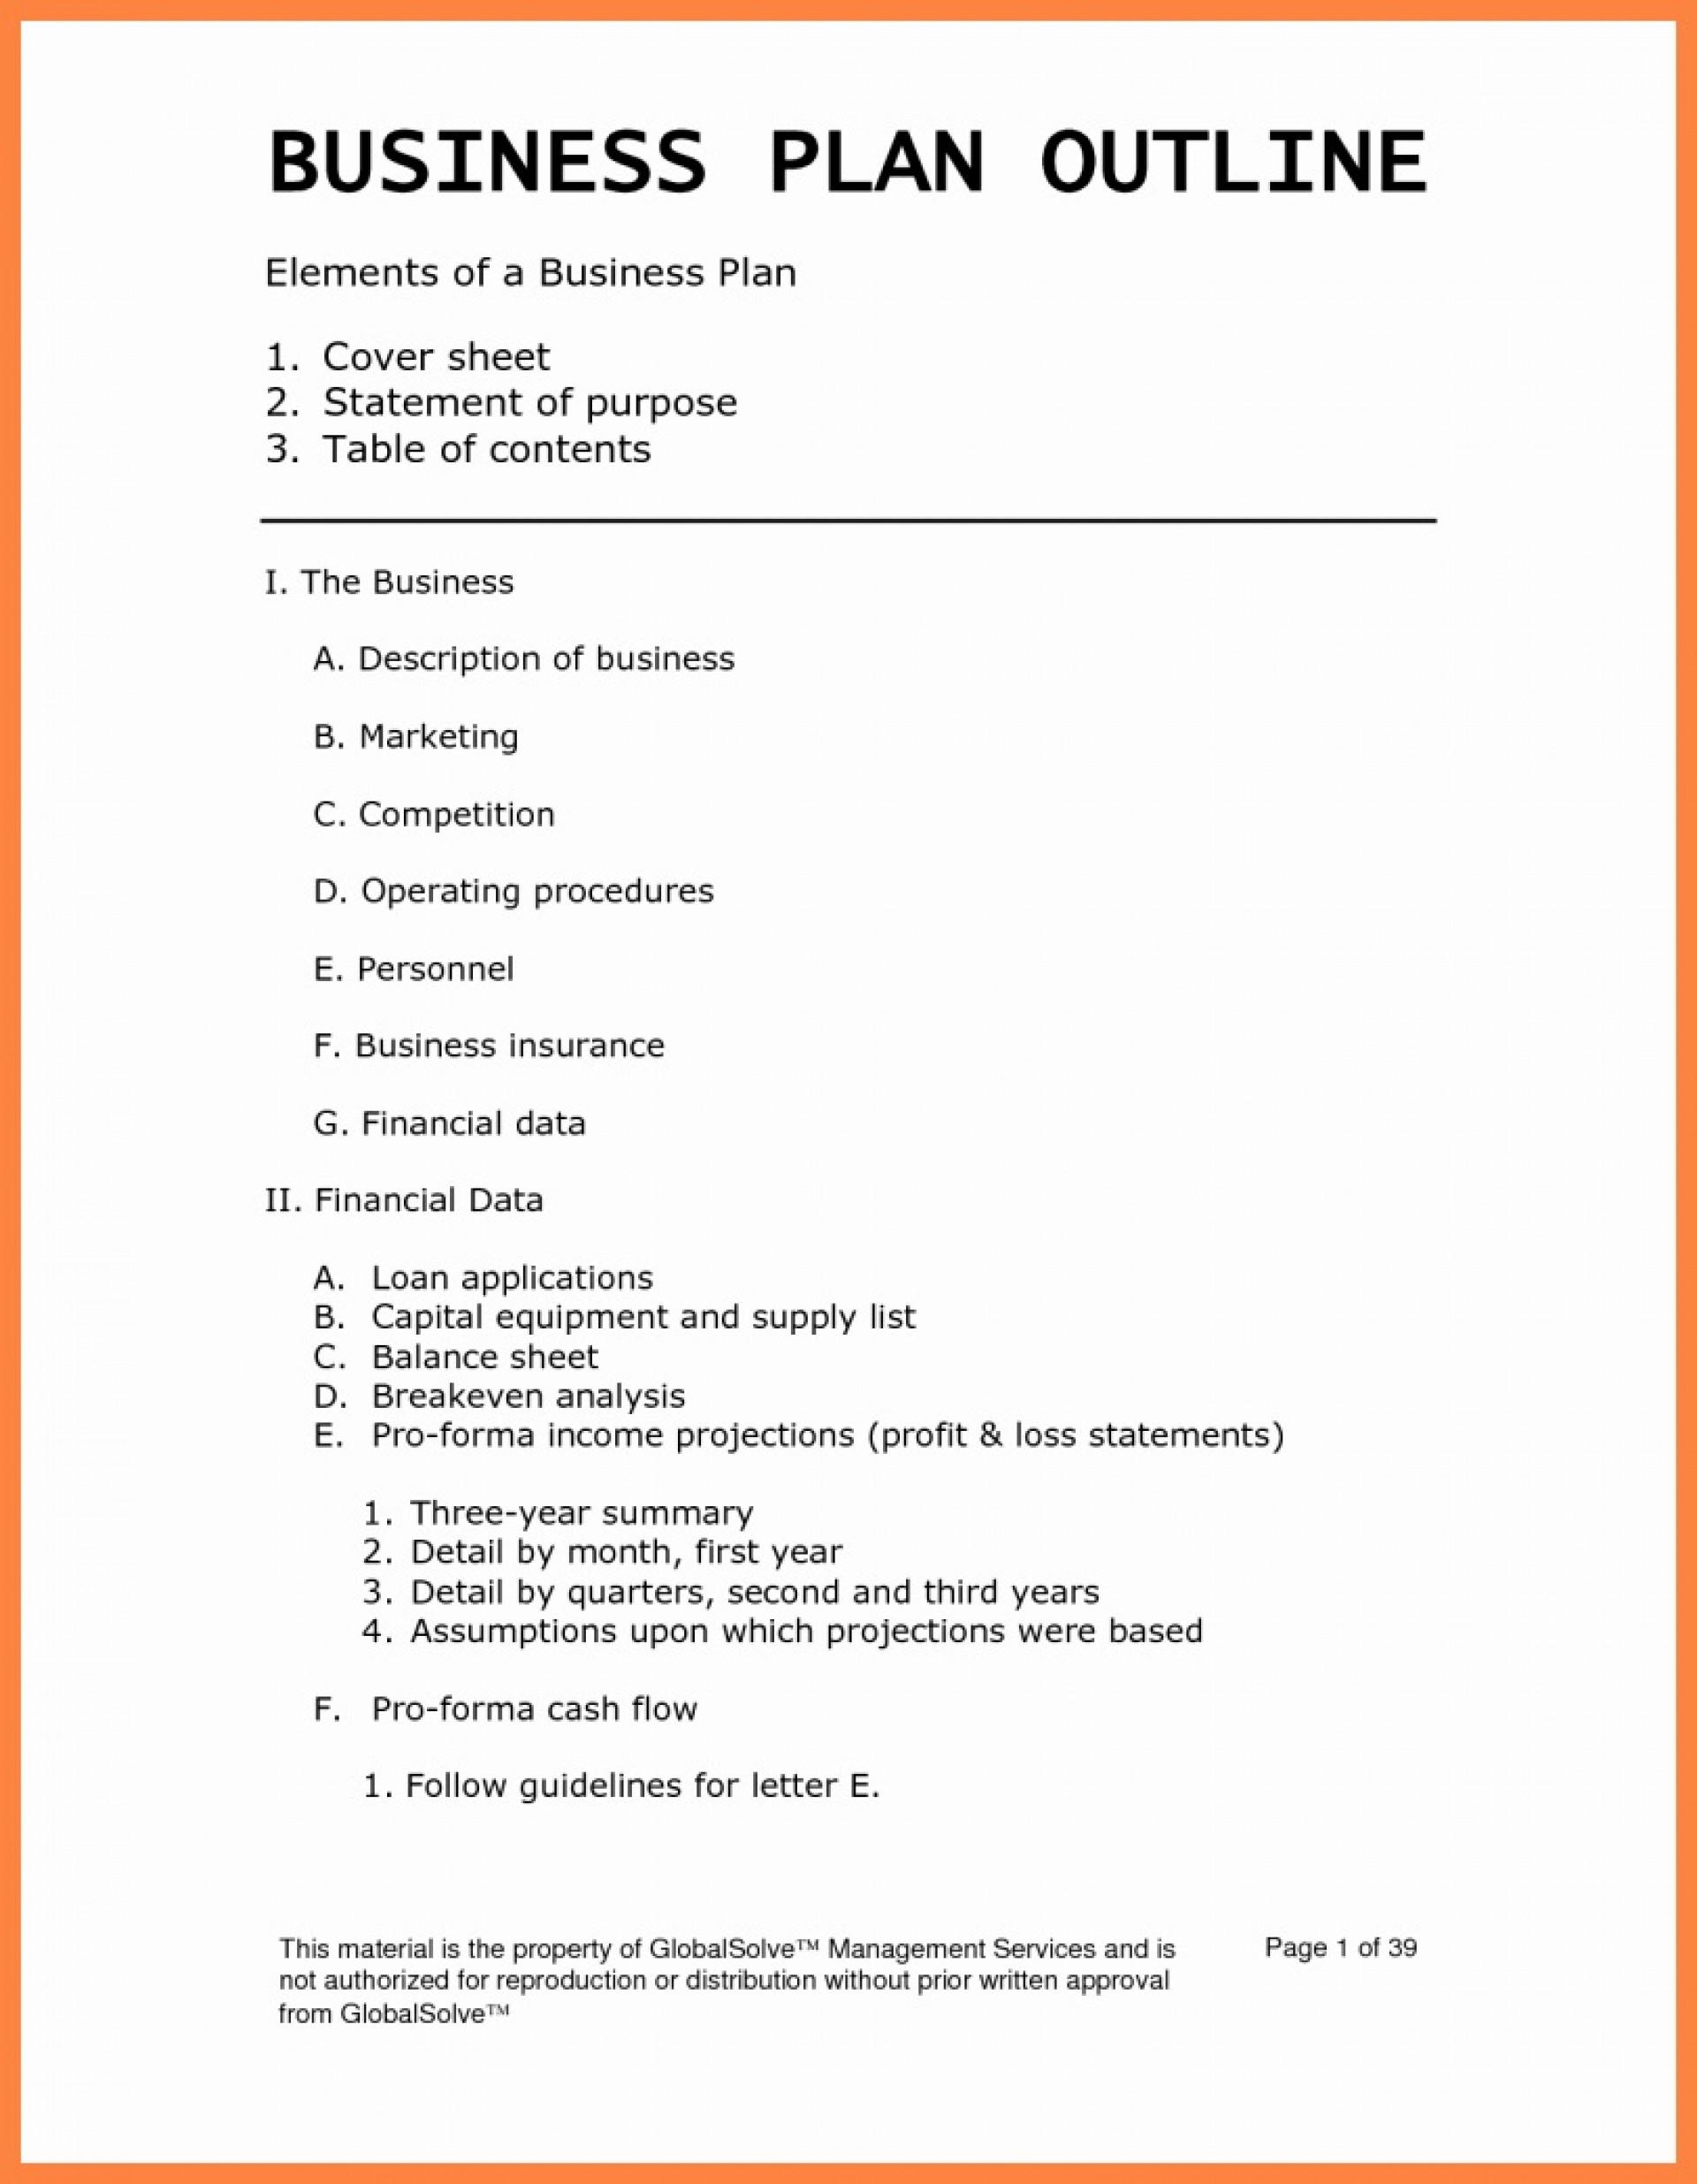 003 Top Busines Plan Template Pdf Image  Restaurant Sample Free Example Uk Doc1920